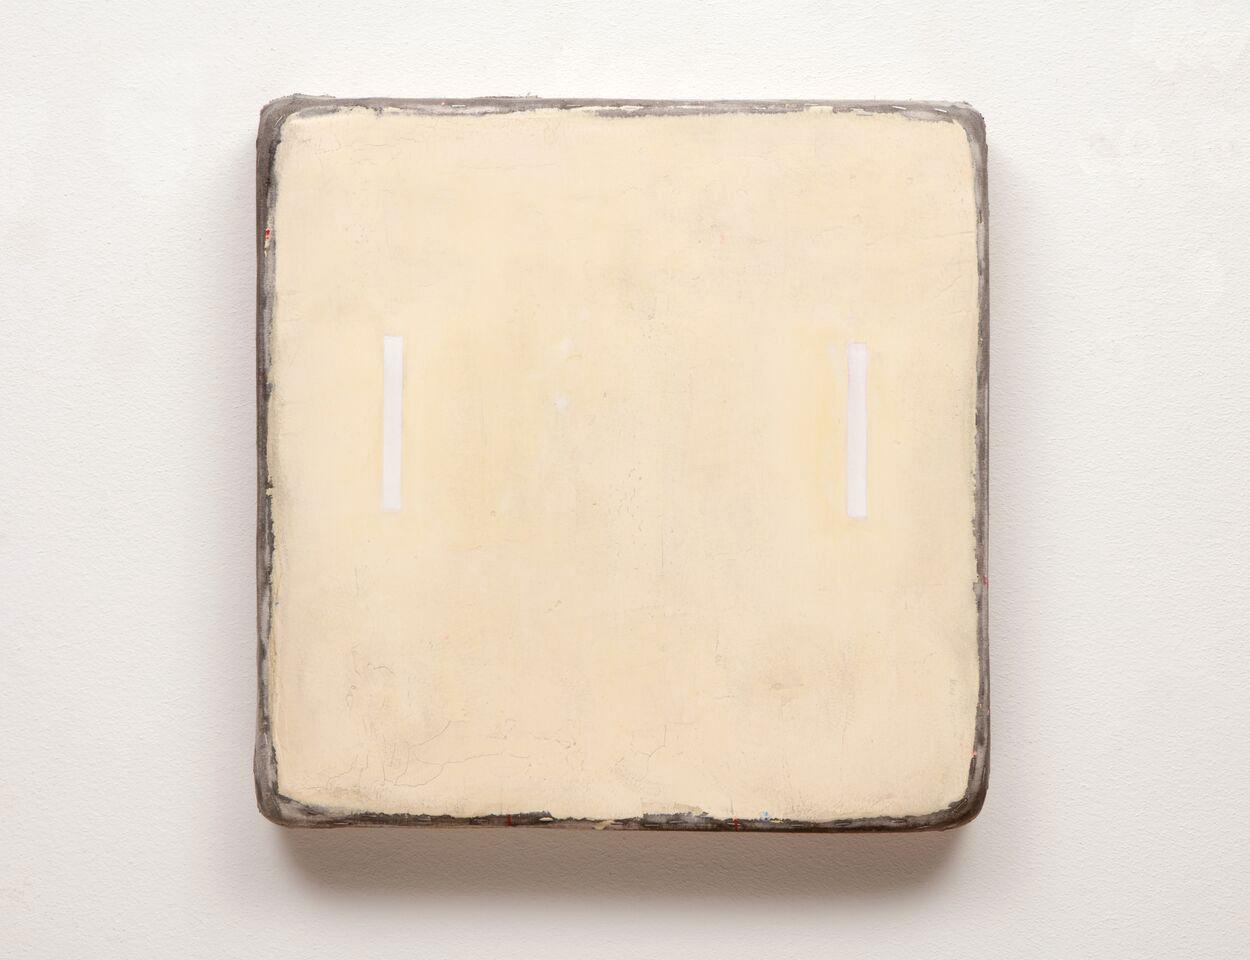 Otis Jones  Yellow with Two White Rectangles  2015  Mixed media on canvas laid on wood panel  61 x 61 x 7.6 cm